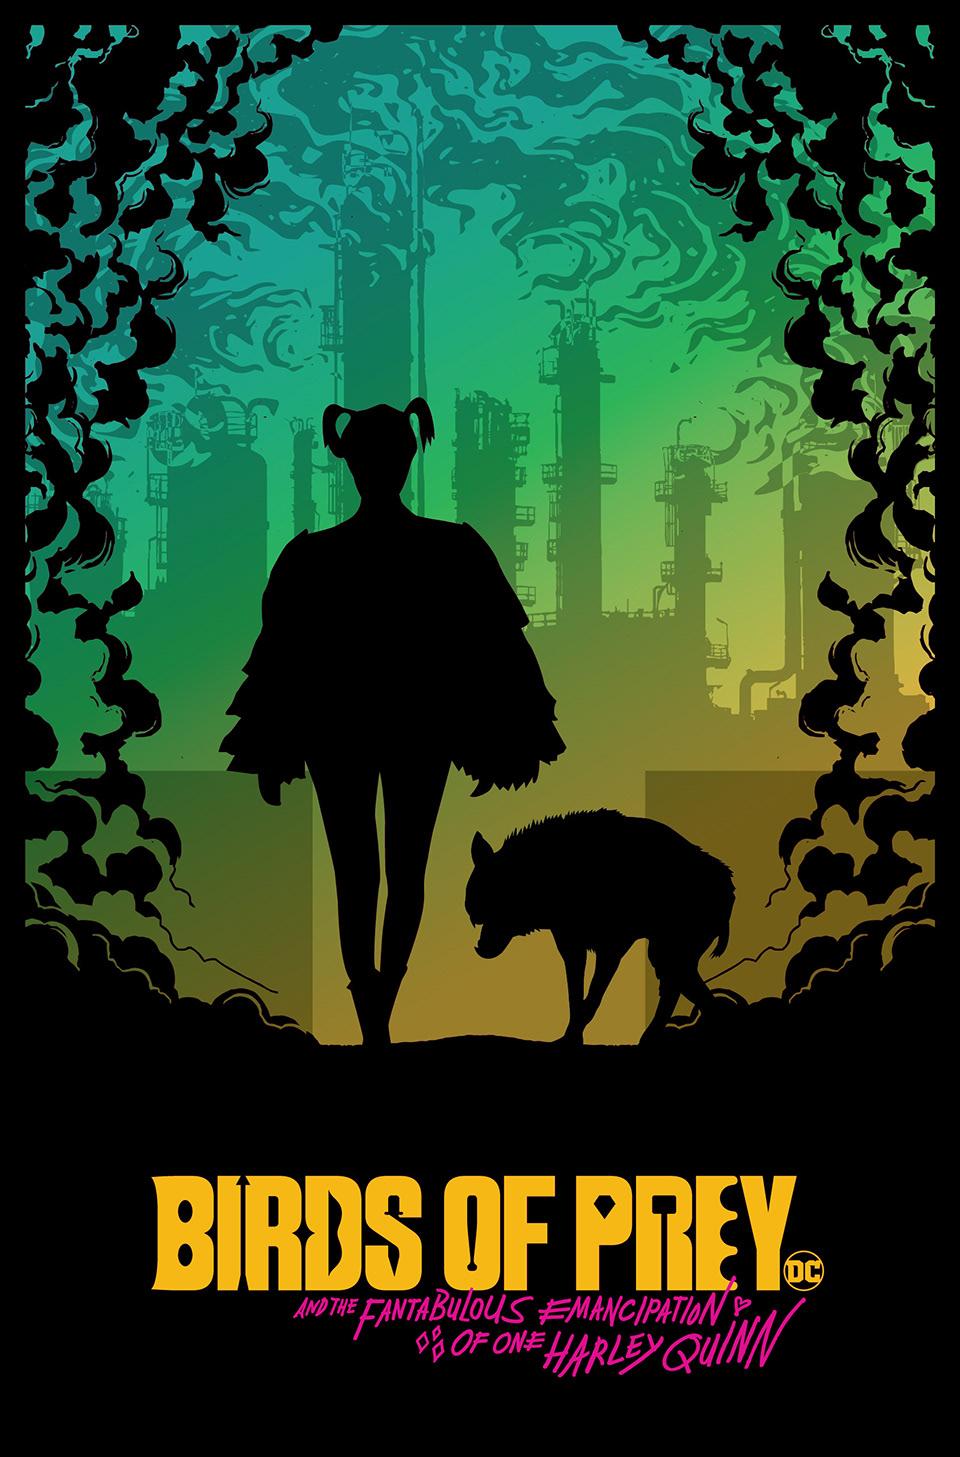 Birds Of Prey 2020 Alternative Movie Poster On Behance